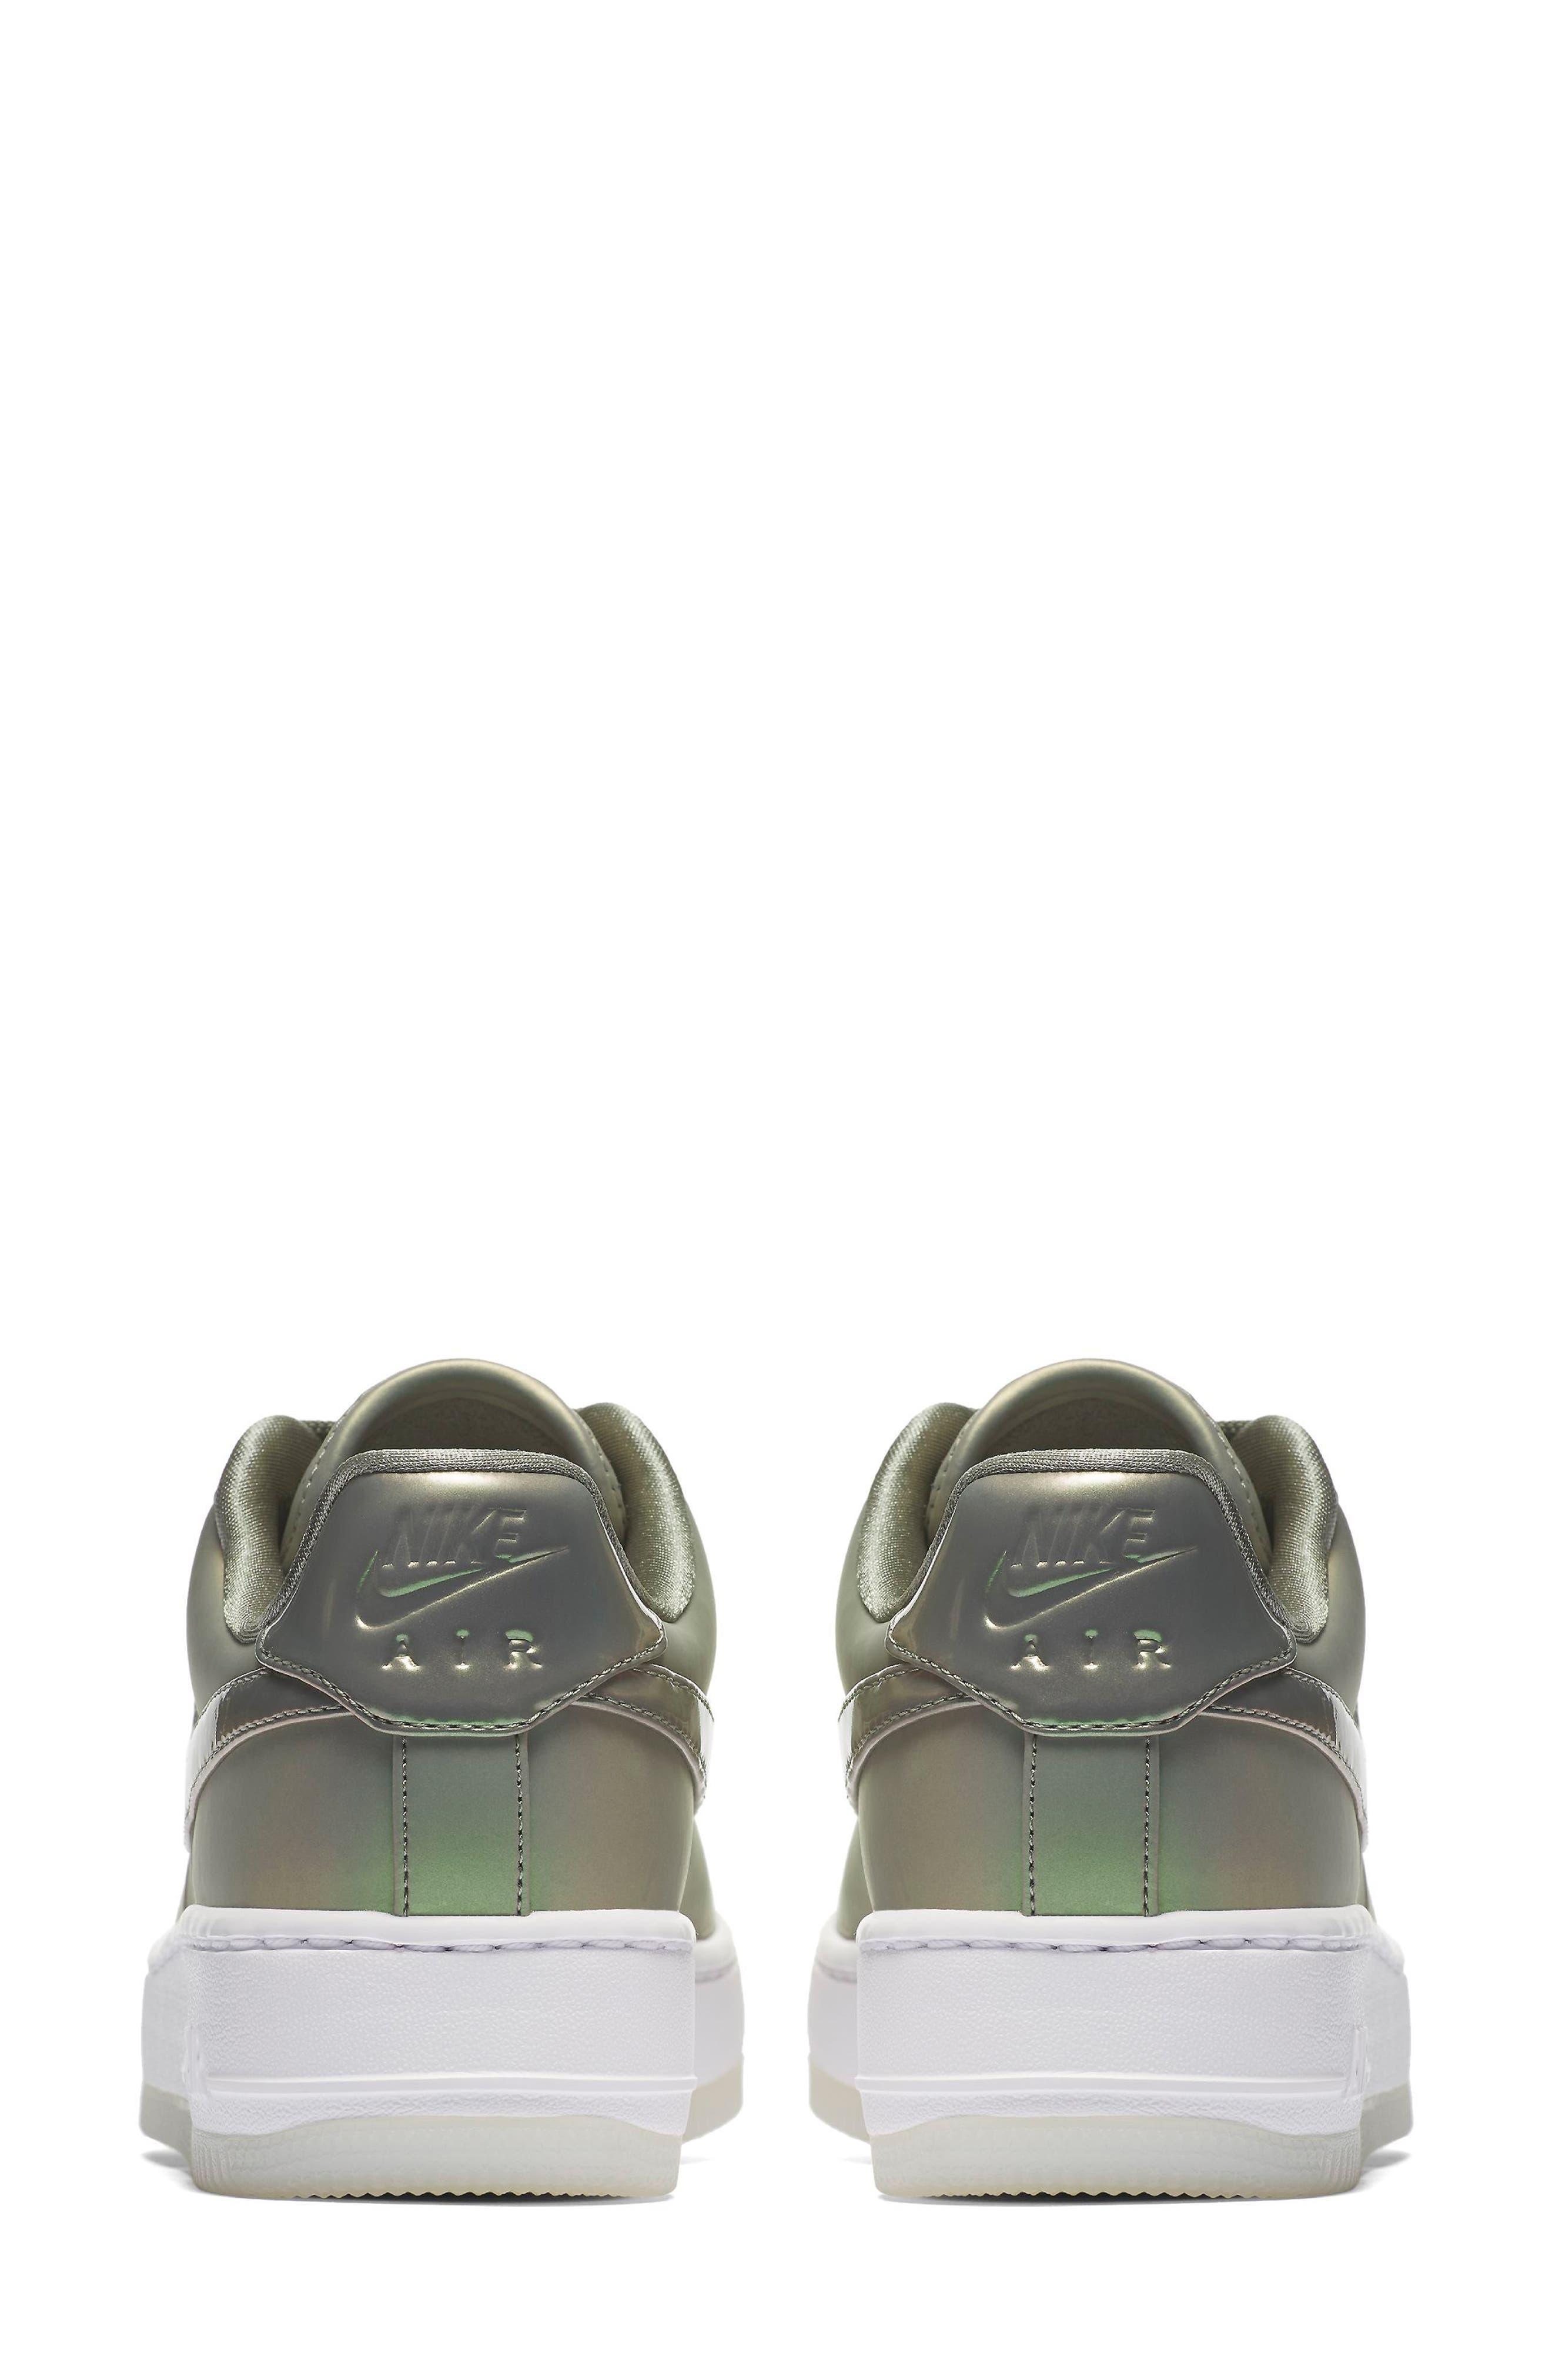 Air Force 1 Upstep Premium LX Shoe,                             Alternate thumbnail 2, color,                             Dark Stucco/ Stucco/ White